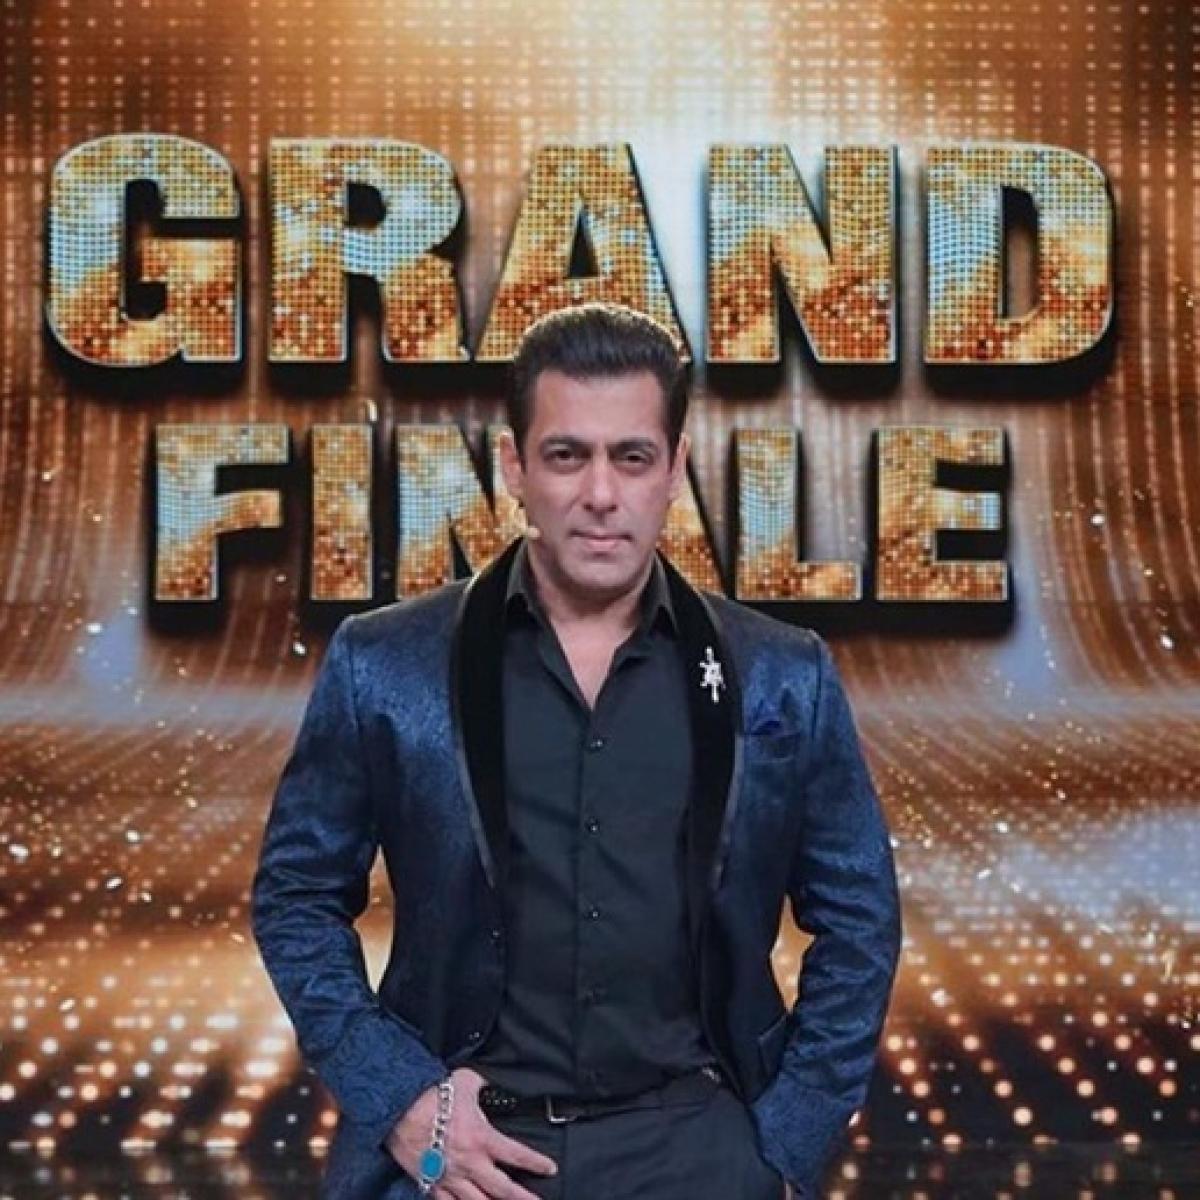 Ouii Ma! Salman Khan thanks fans as his Instagram following hits 30 million